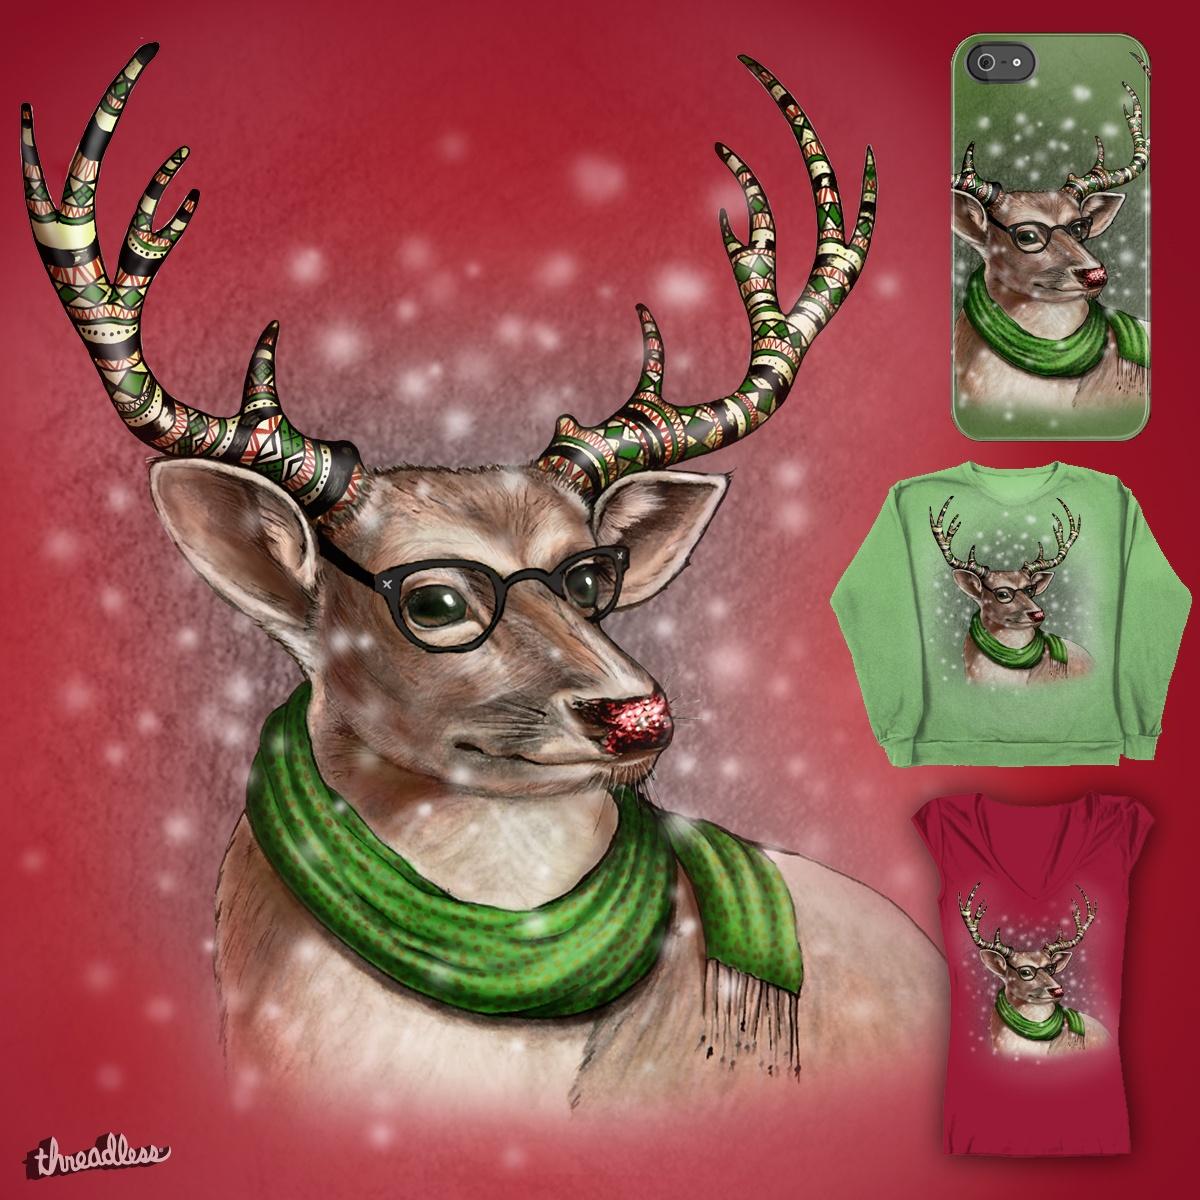 Fairisle Reindeer by Werkmeister on Threadless